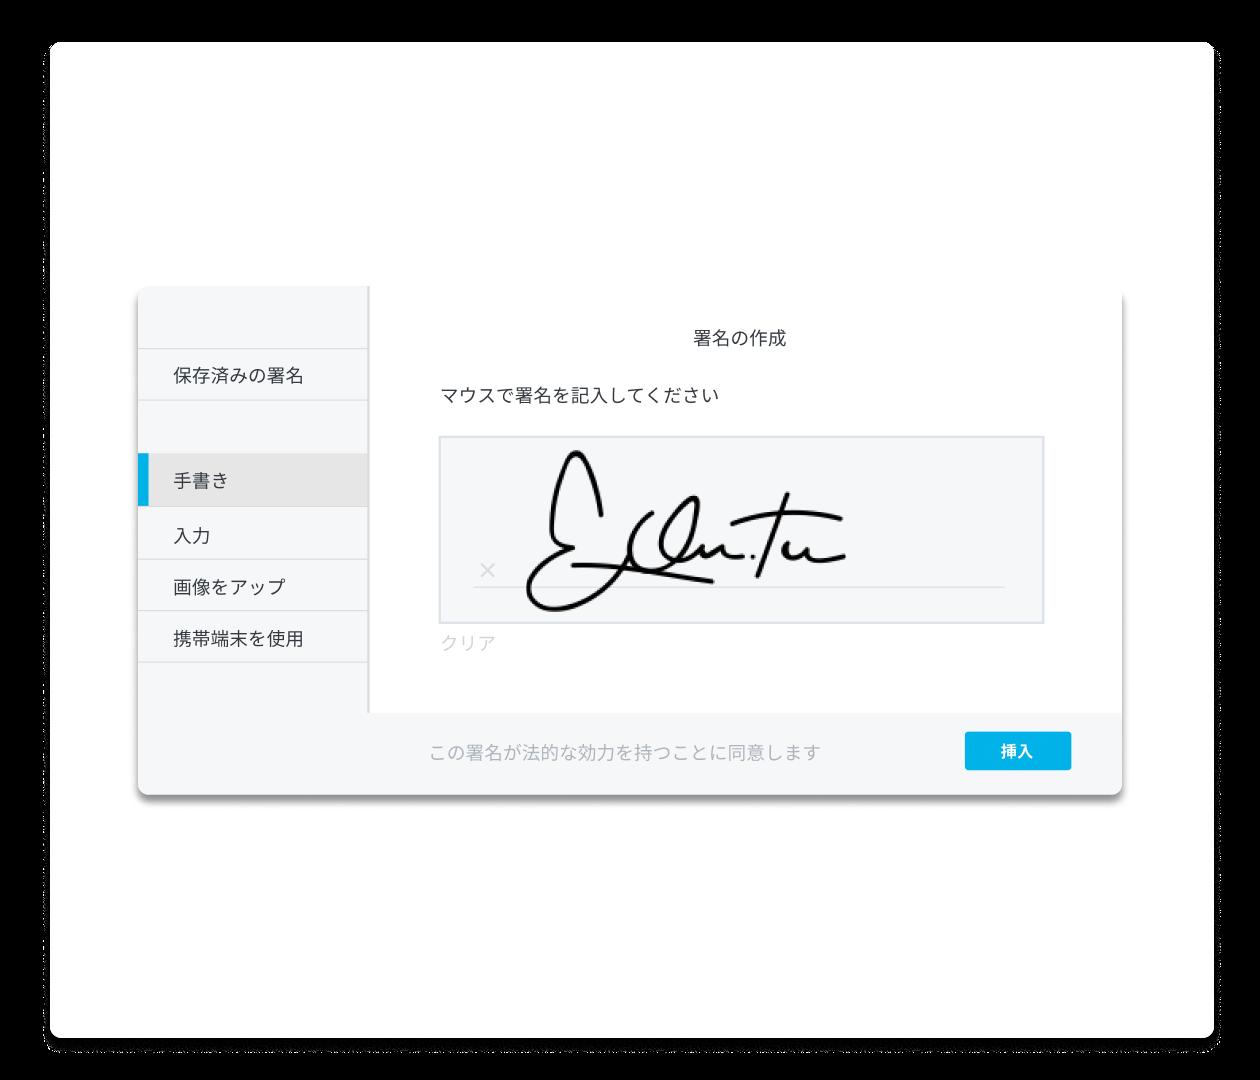 HelloSign の署名作成操作のスクリーンショット